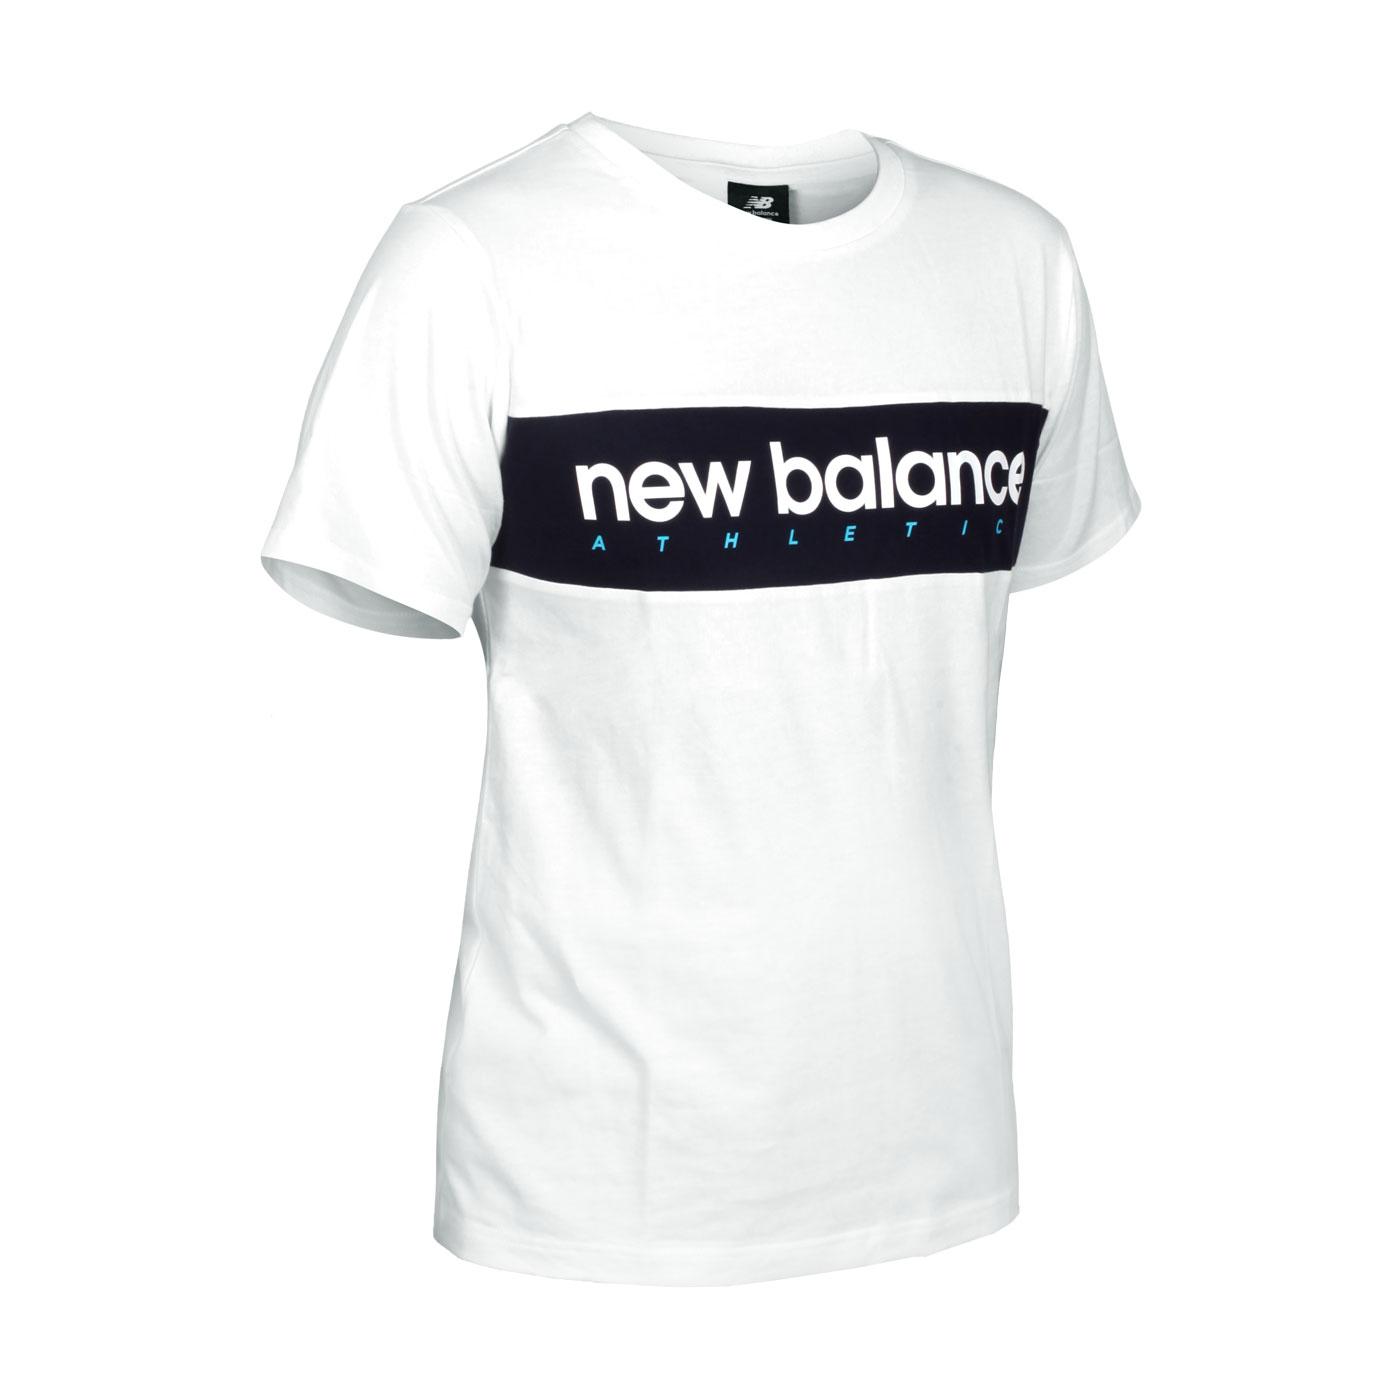 NEW BALANCE 男款橫條品牌短袖T恤 AMT11548WT